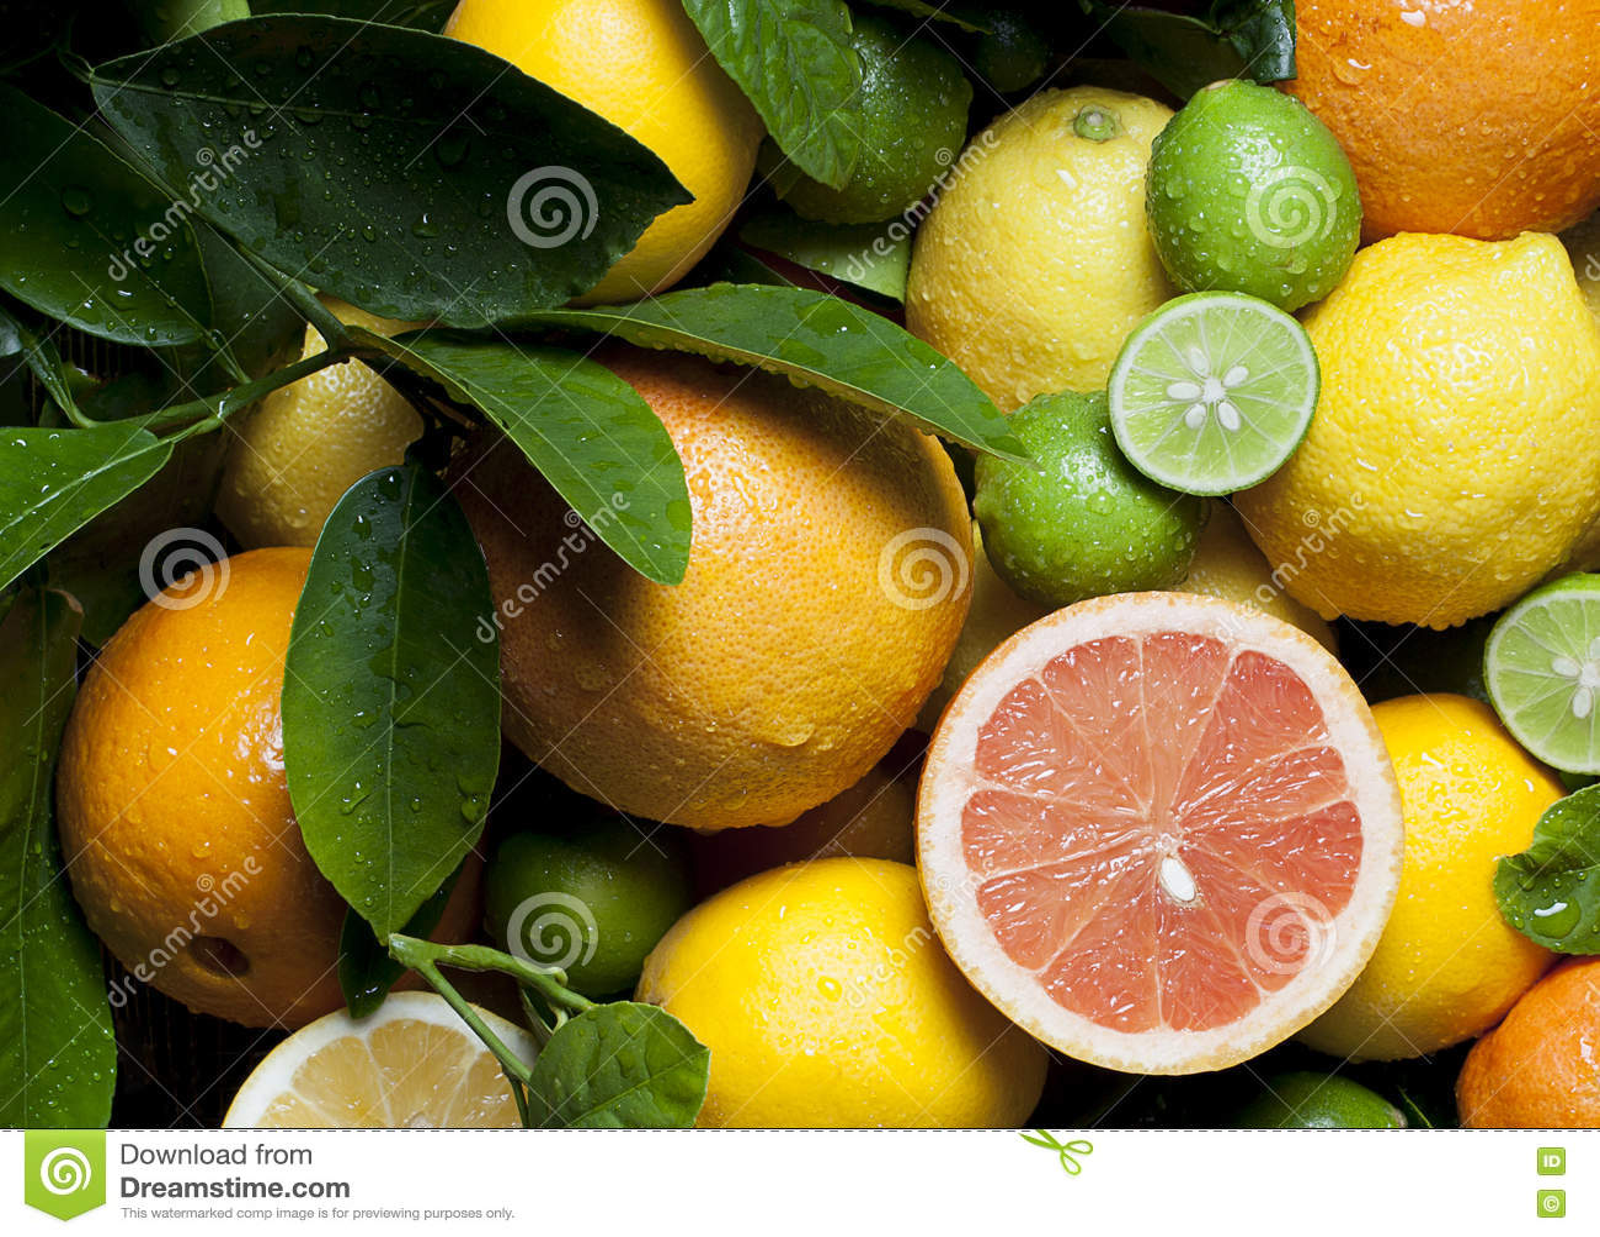 Grapefruit Oranges Lemons Limes